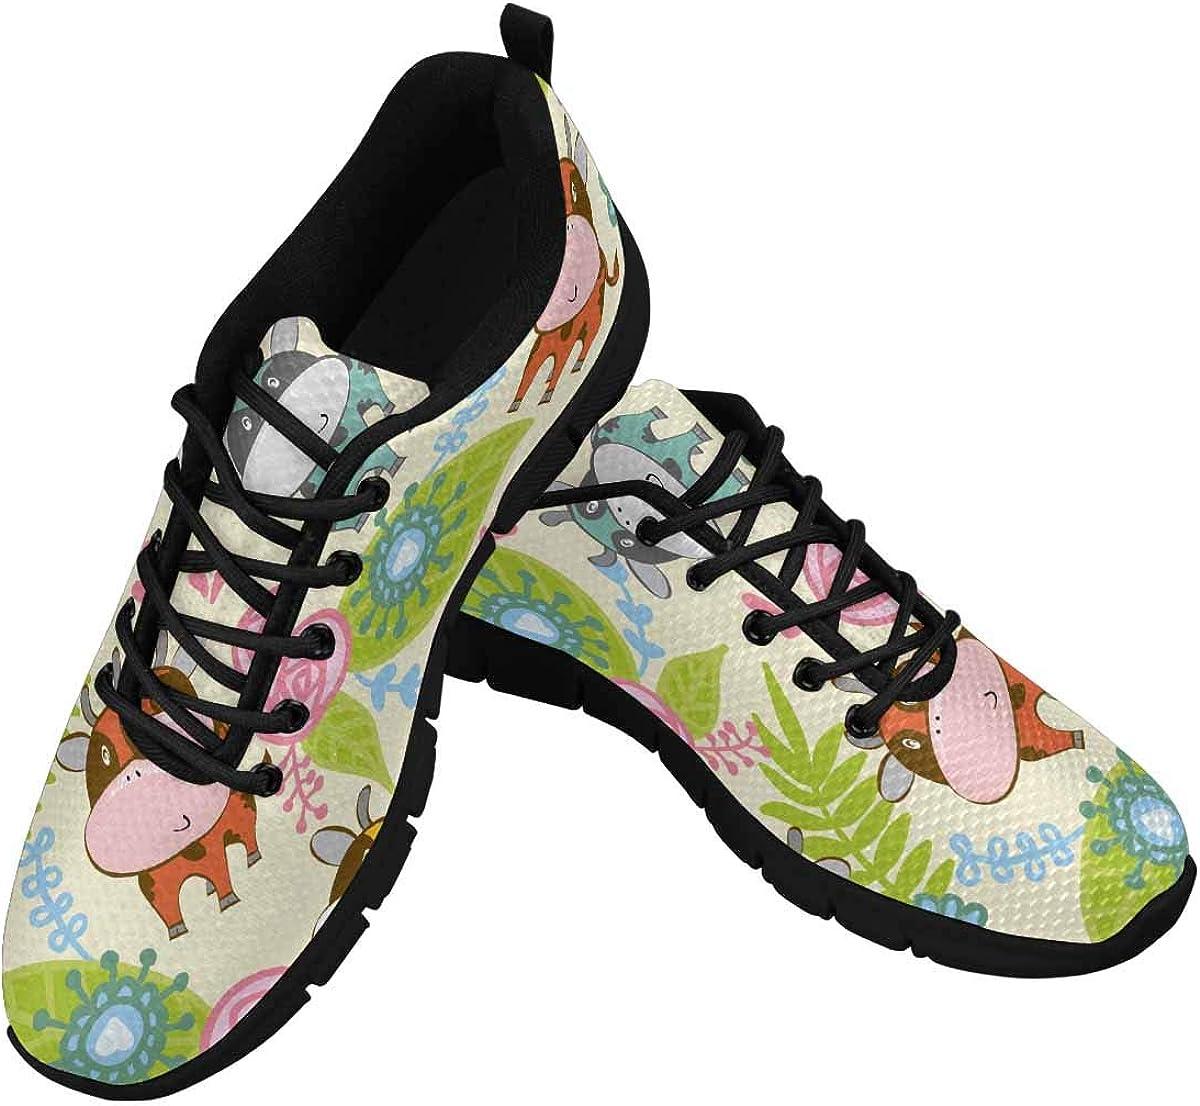 InterestPrint Cartoon Cows Leaves Women's Athletic Walking Running Sneakers Comfortable Lightweight Shoes